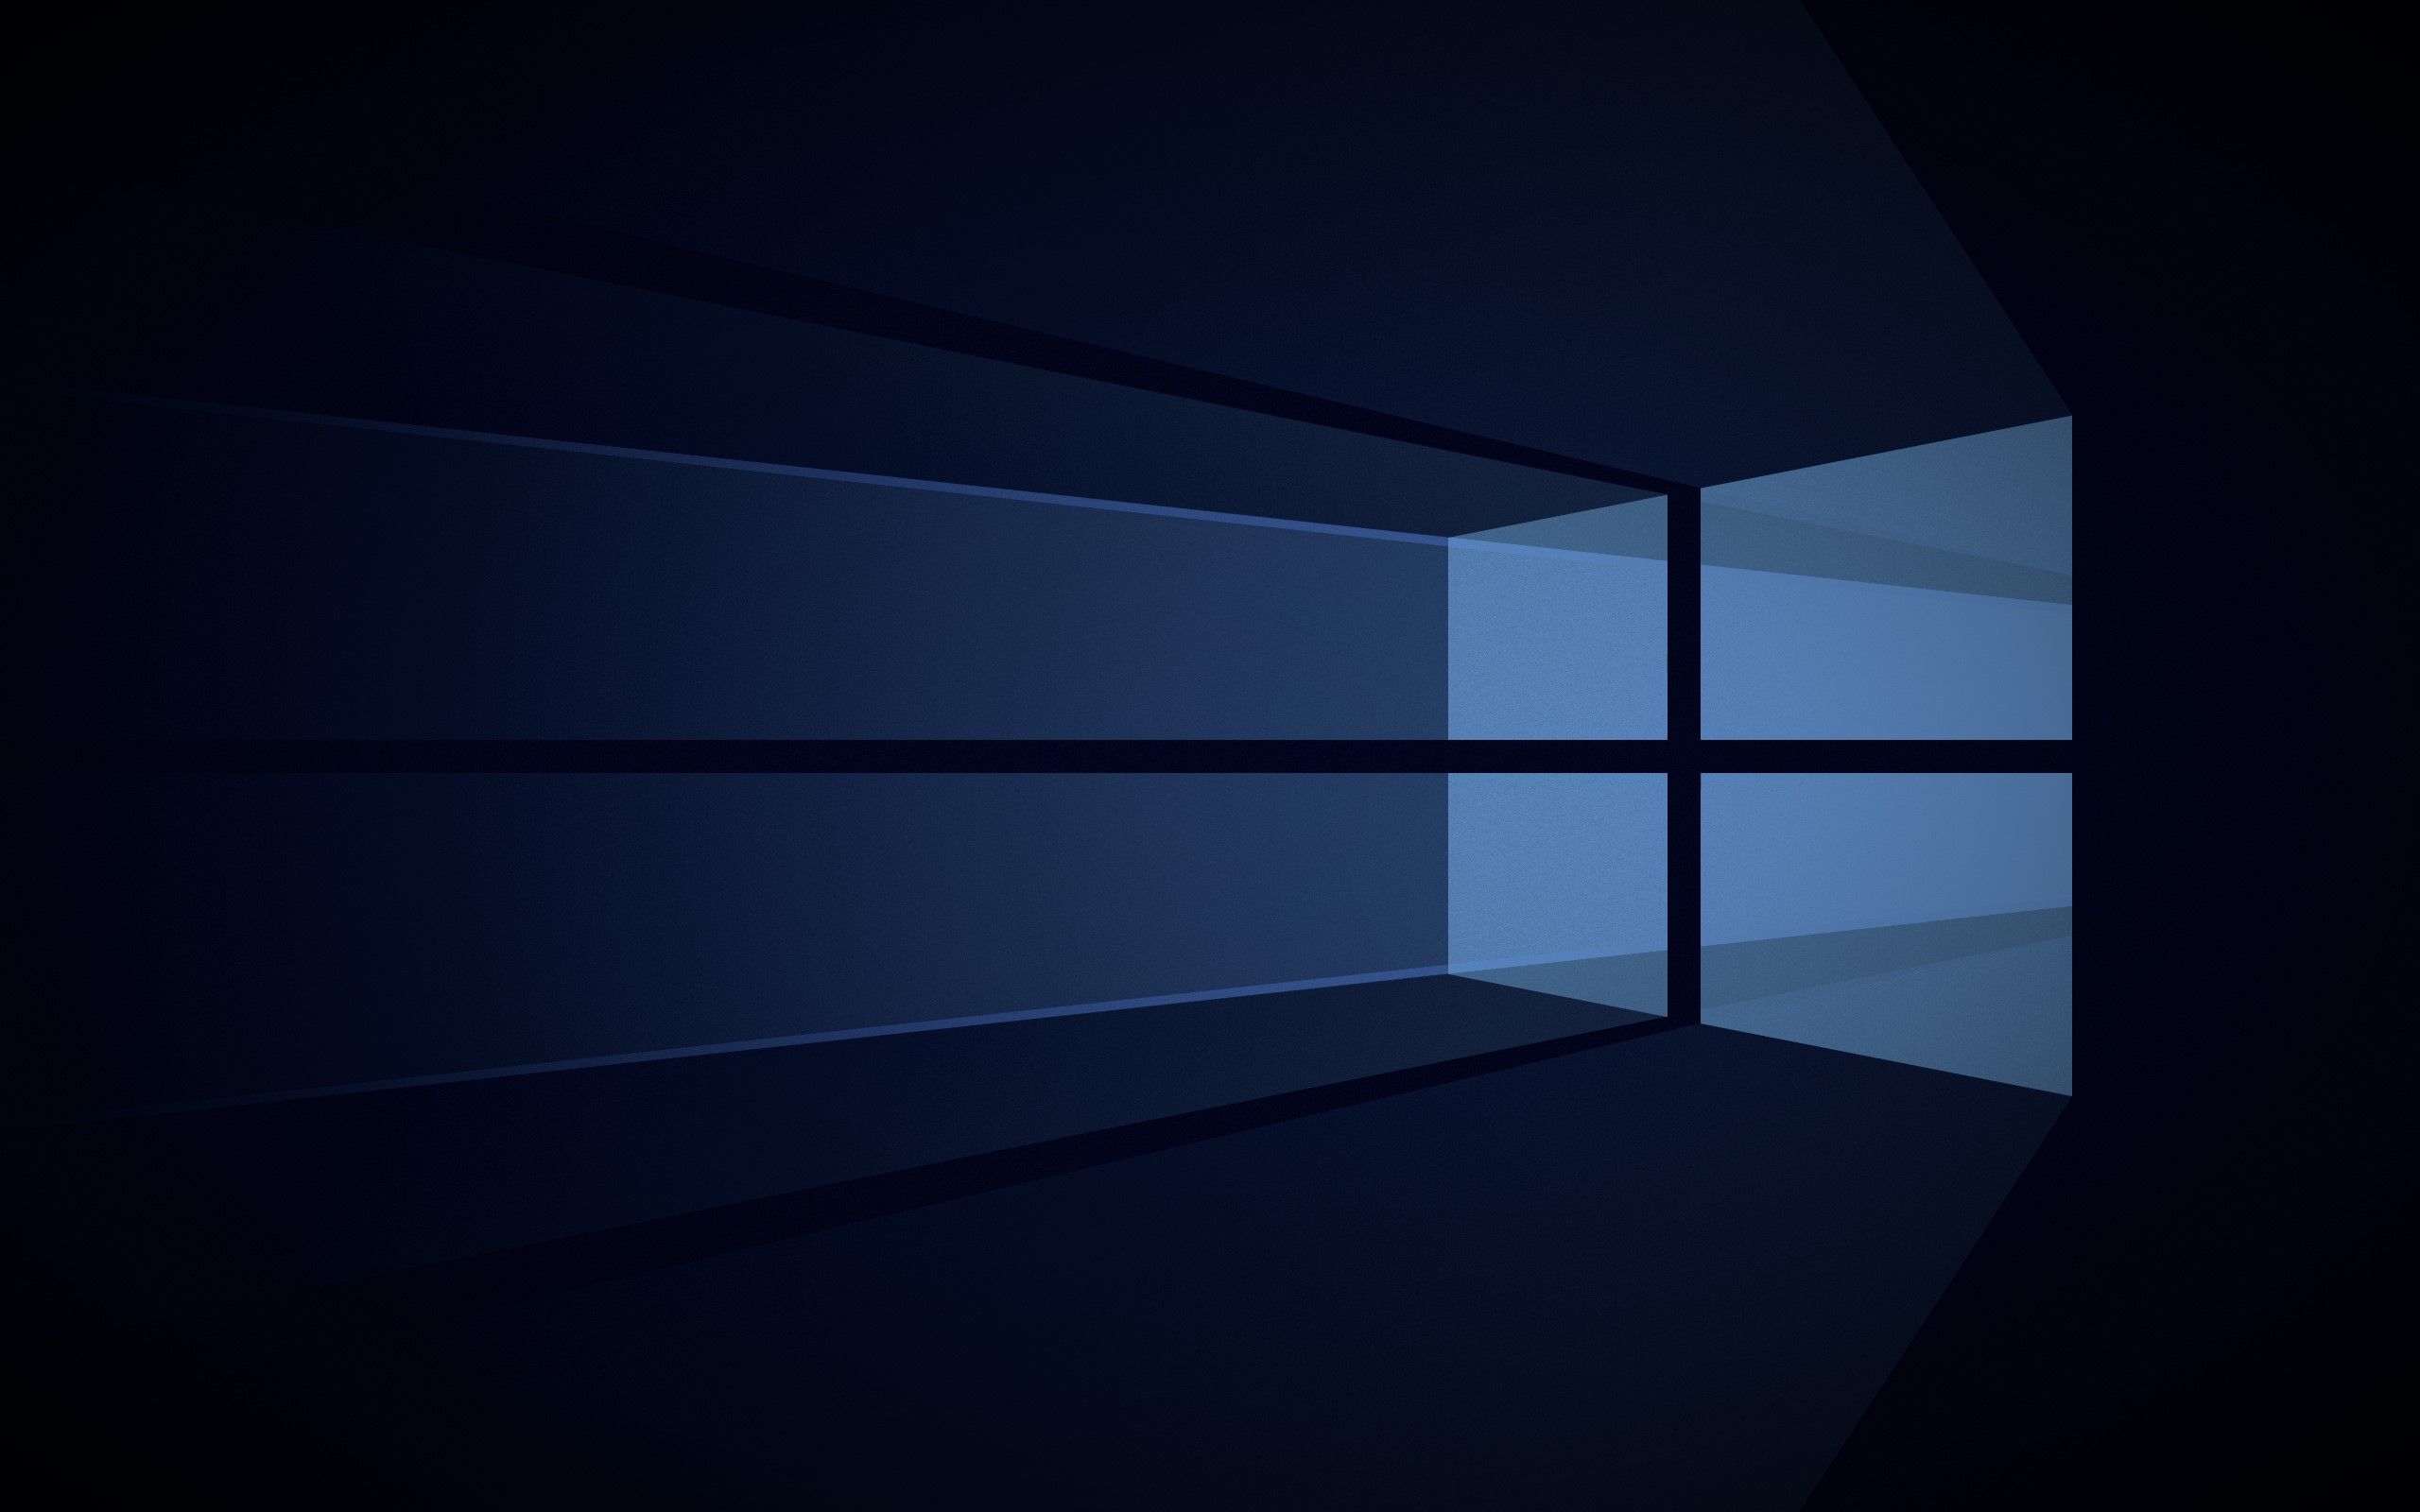 Minimalist ModernFlat UI version of the Windows 10 Hero Wallpaper 2560x1600